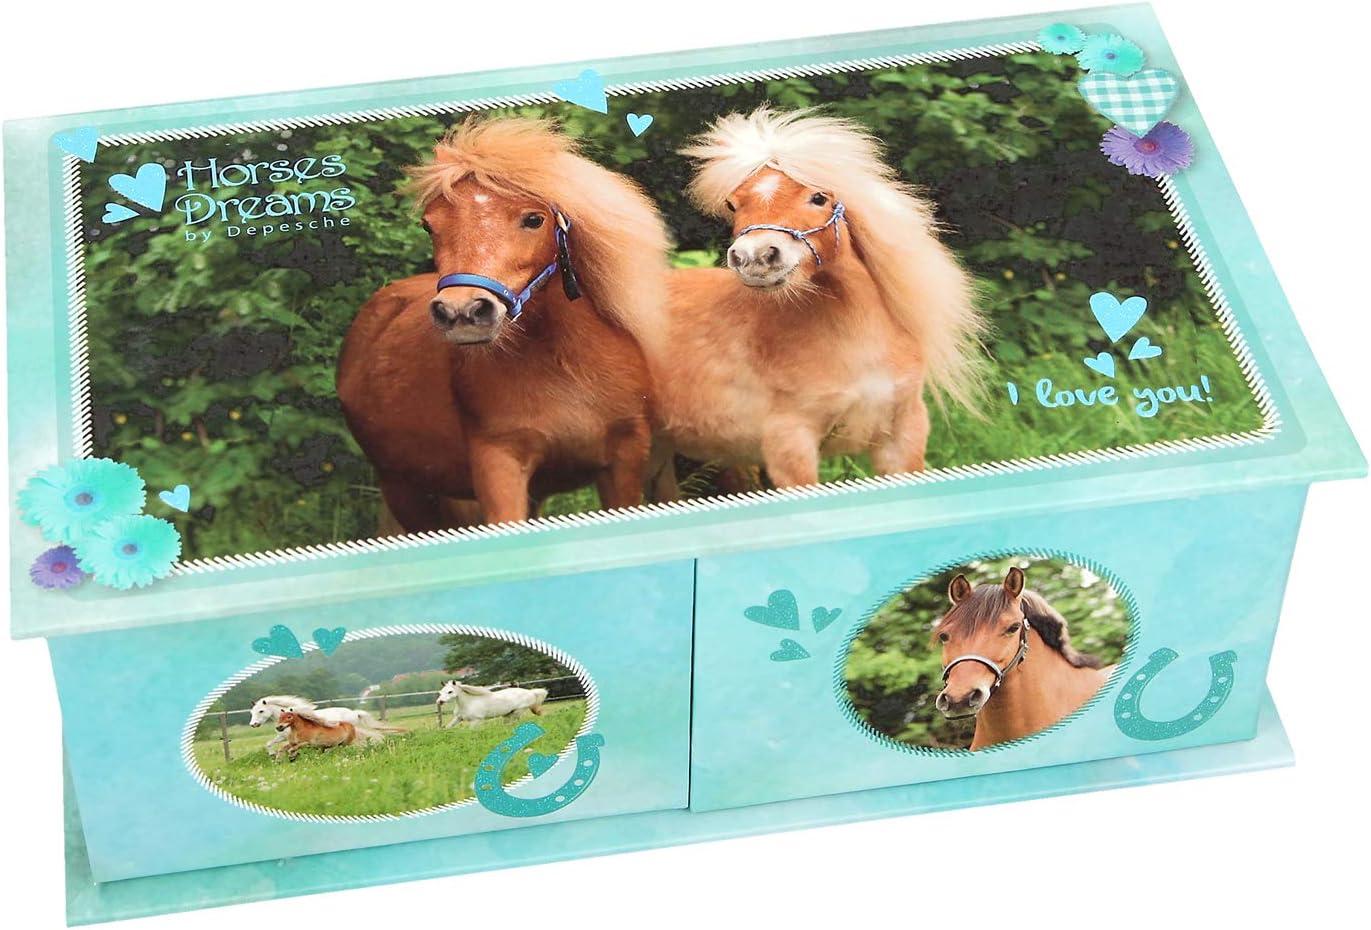 NEW HORSES DREAMS HORSES DREAMS JEWELLERY BOX BLUE